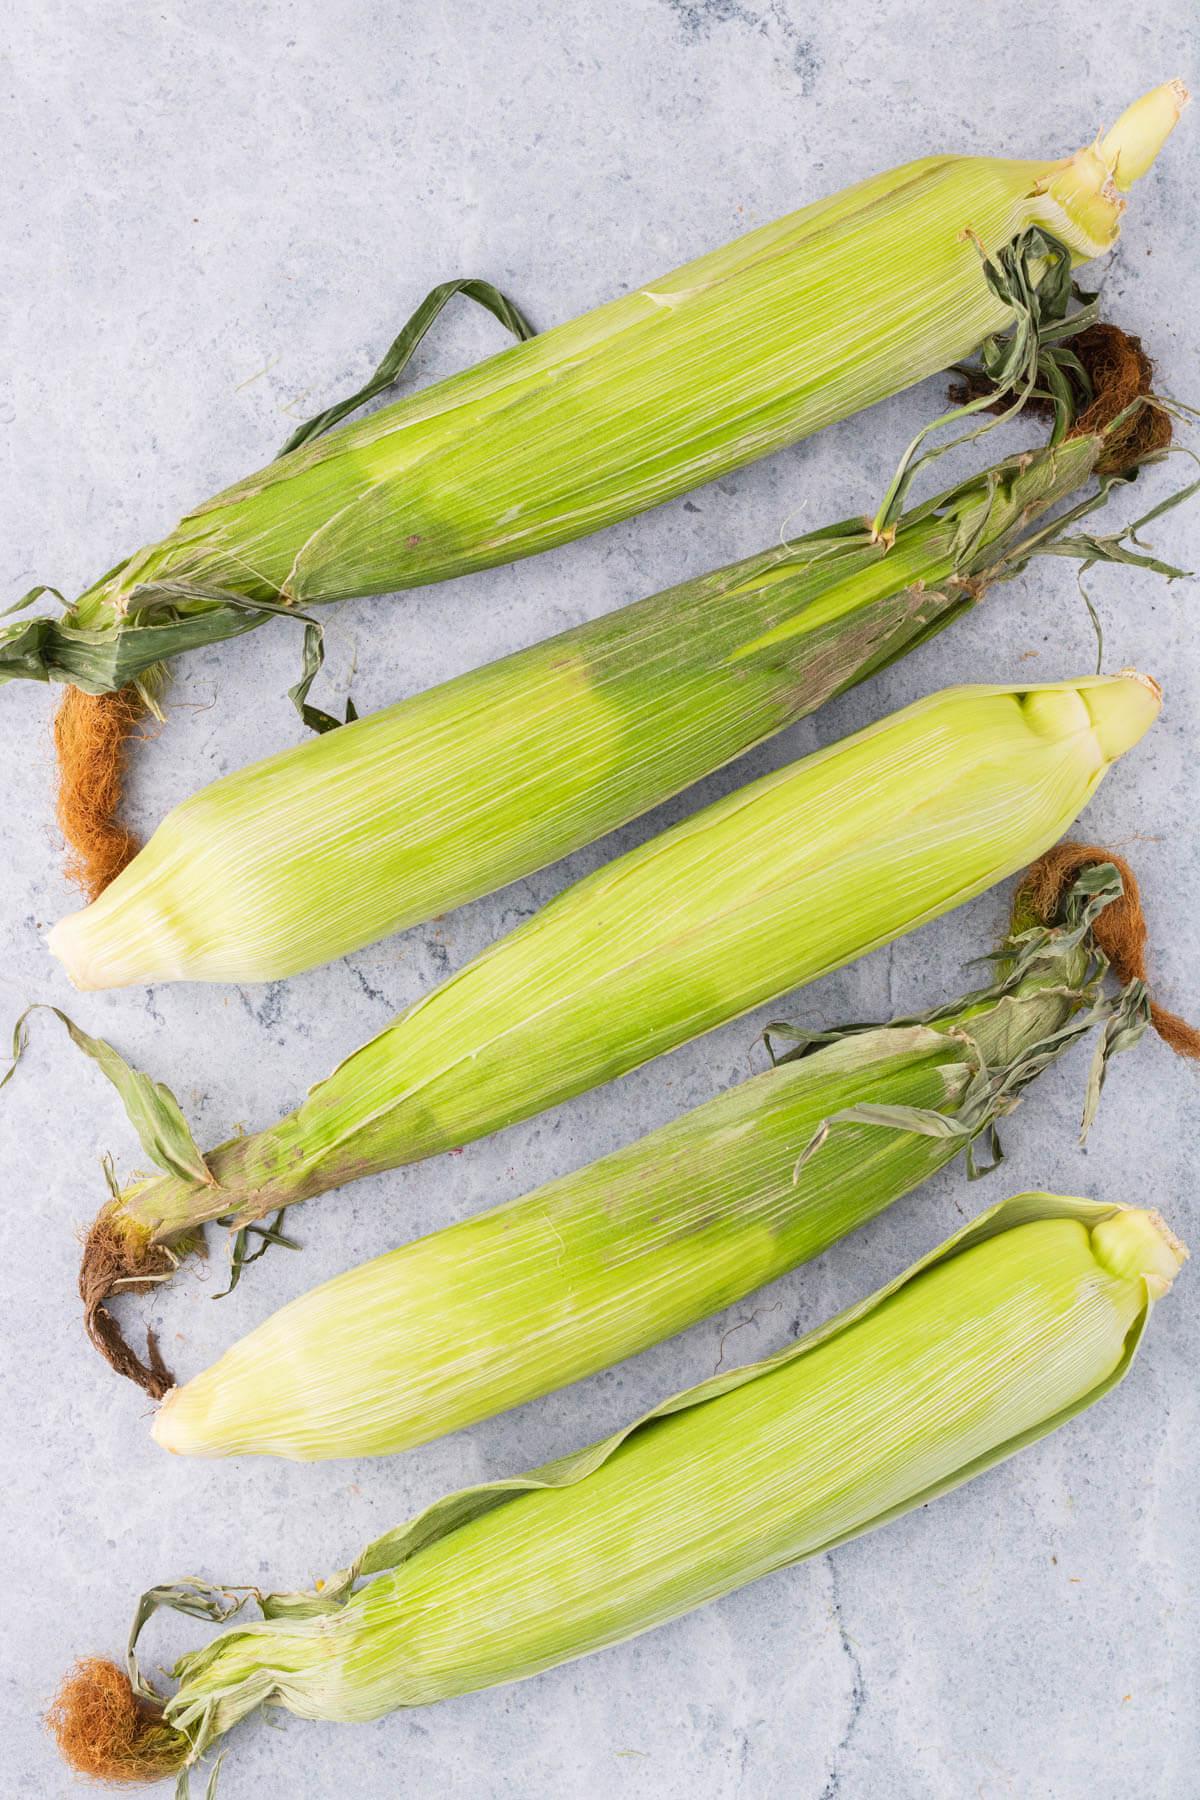 Five green fresh ears of corn.